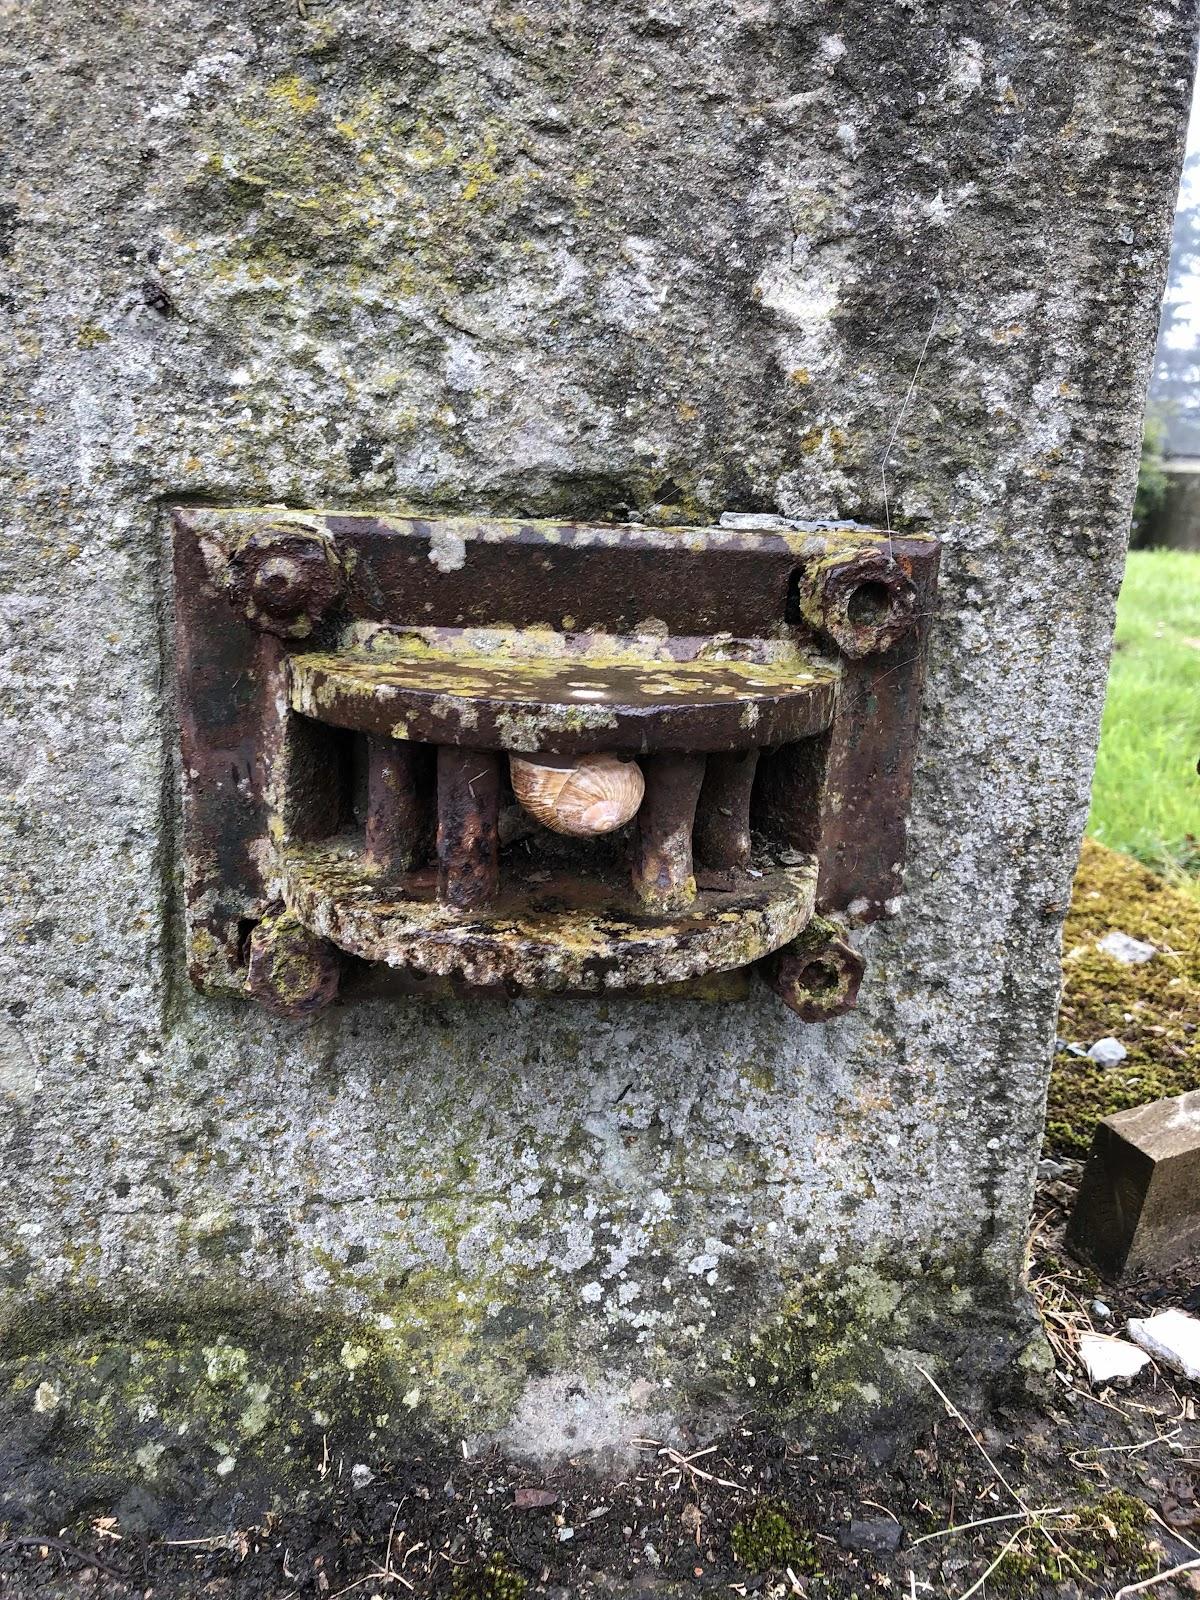 Snail micro geocache